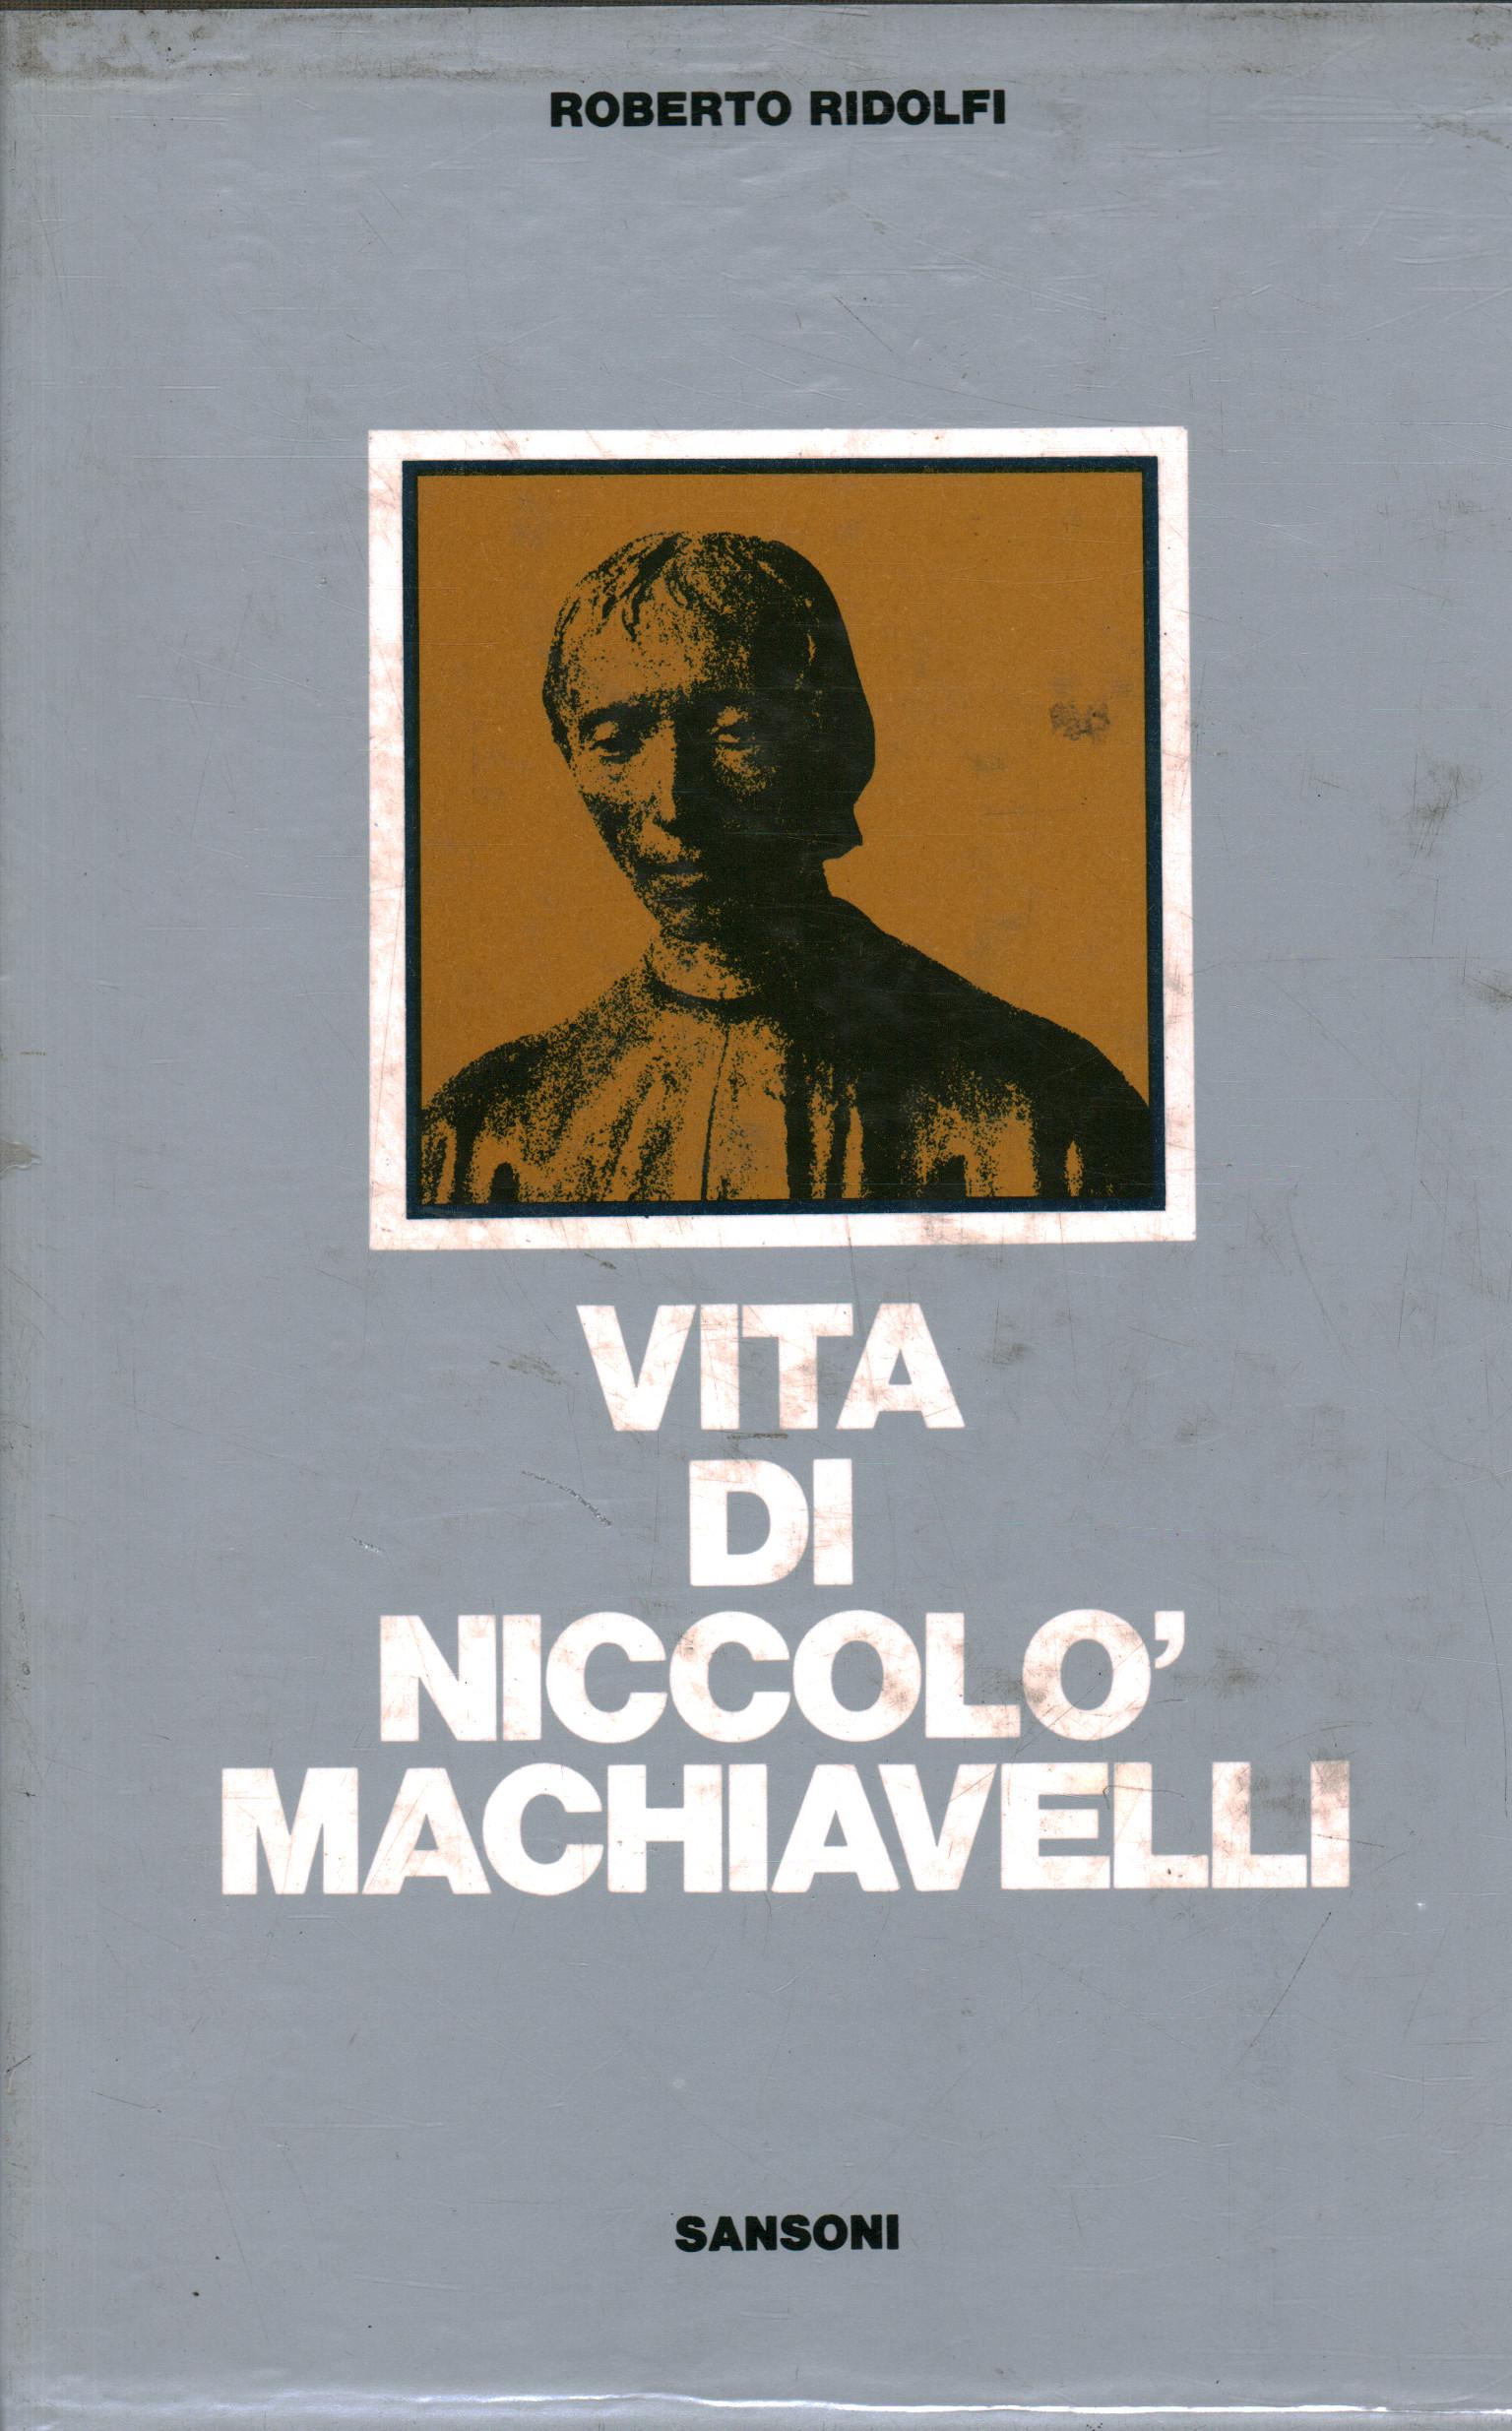 Vita di Niccolò Machiavelli (2 Volumi) - Roberto Ridolfi - Biografie Diari  e Memorie - Storia - Libreria - dimanoinmano.it